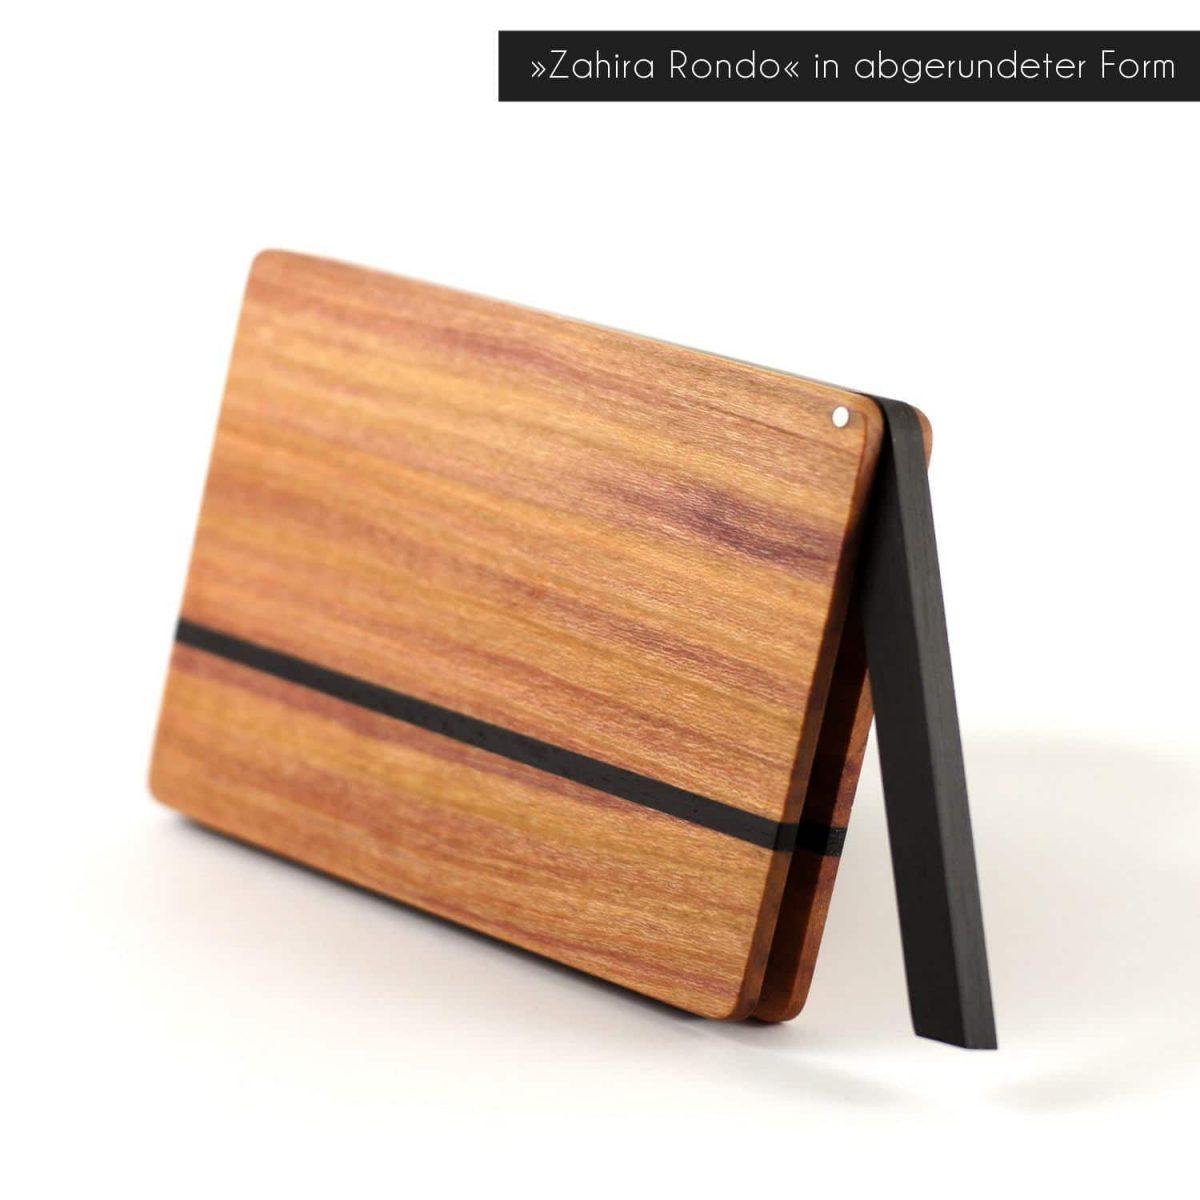 Visitenkartenetui »Zahira Rondo« in abgerundeter Form